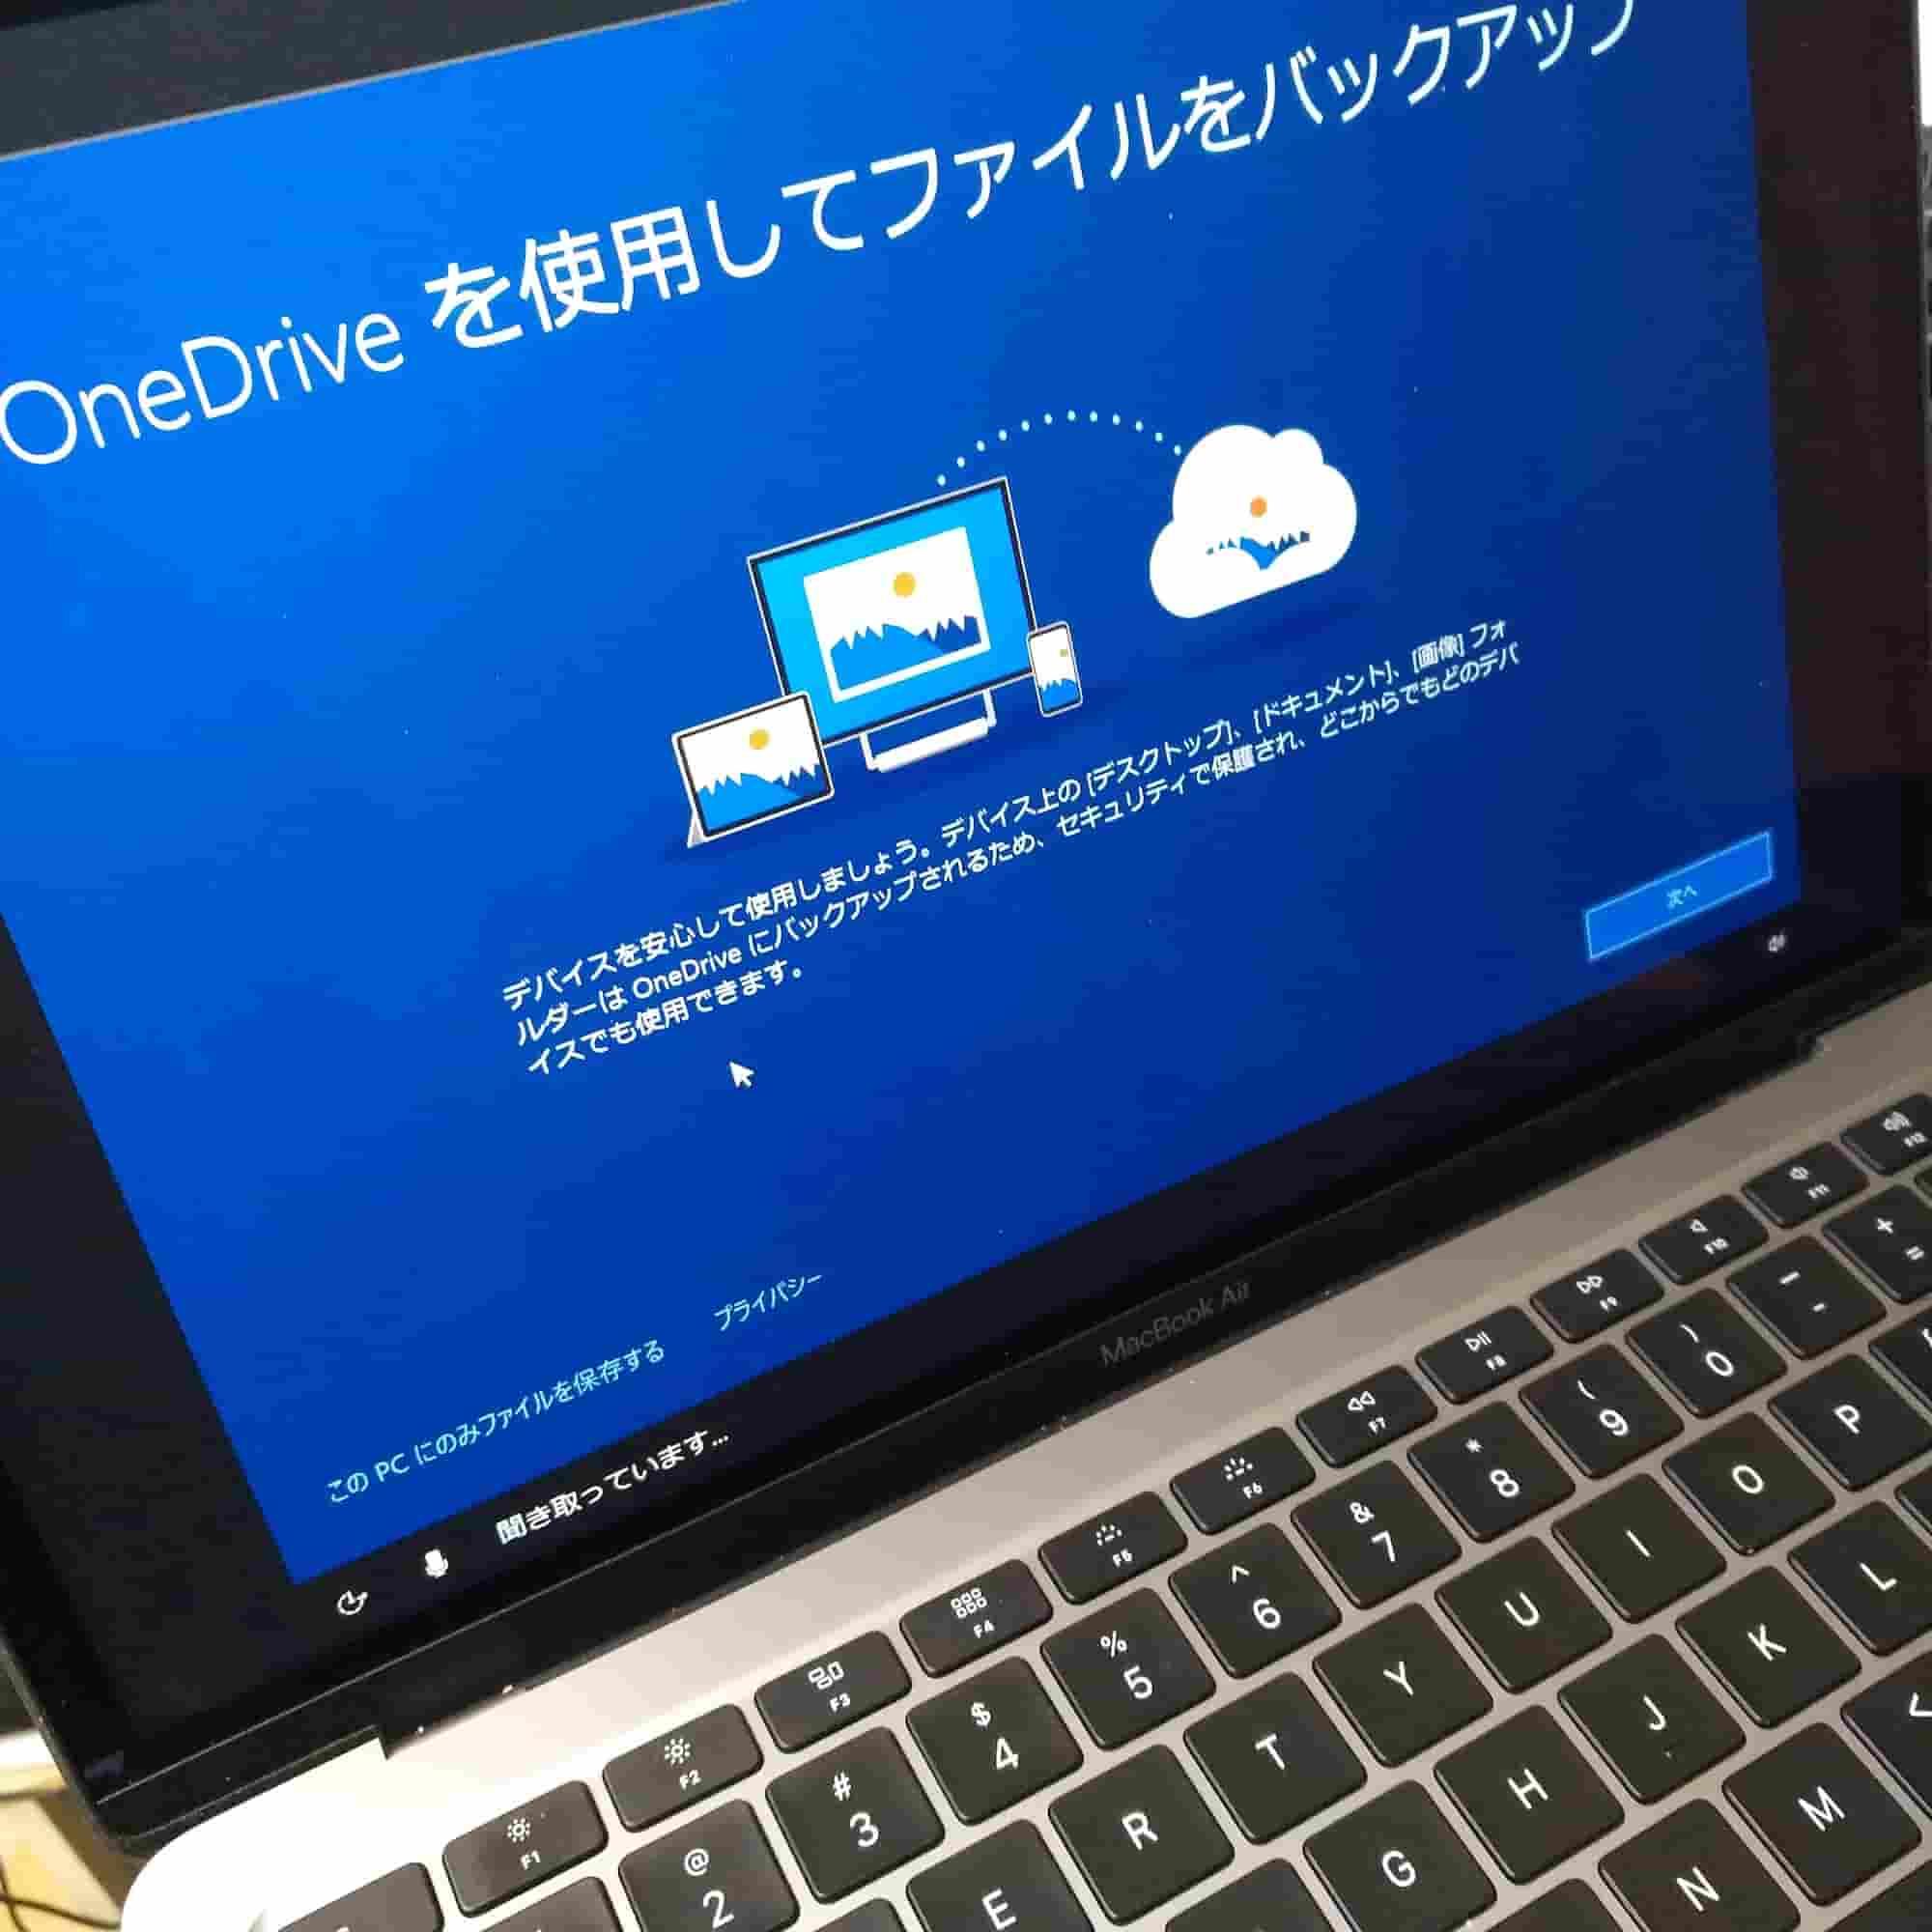 windows10 install onedrive